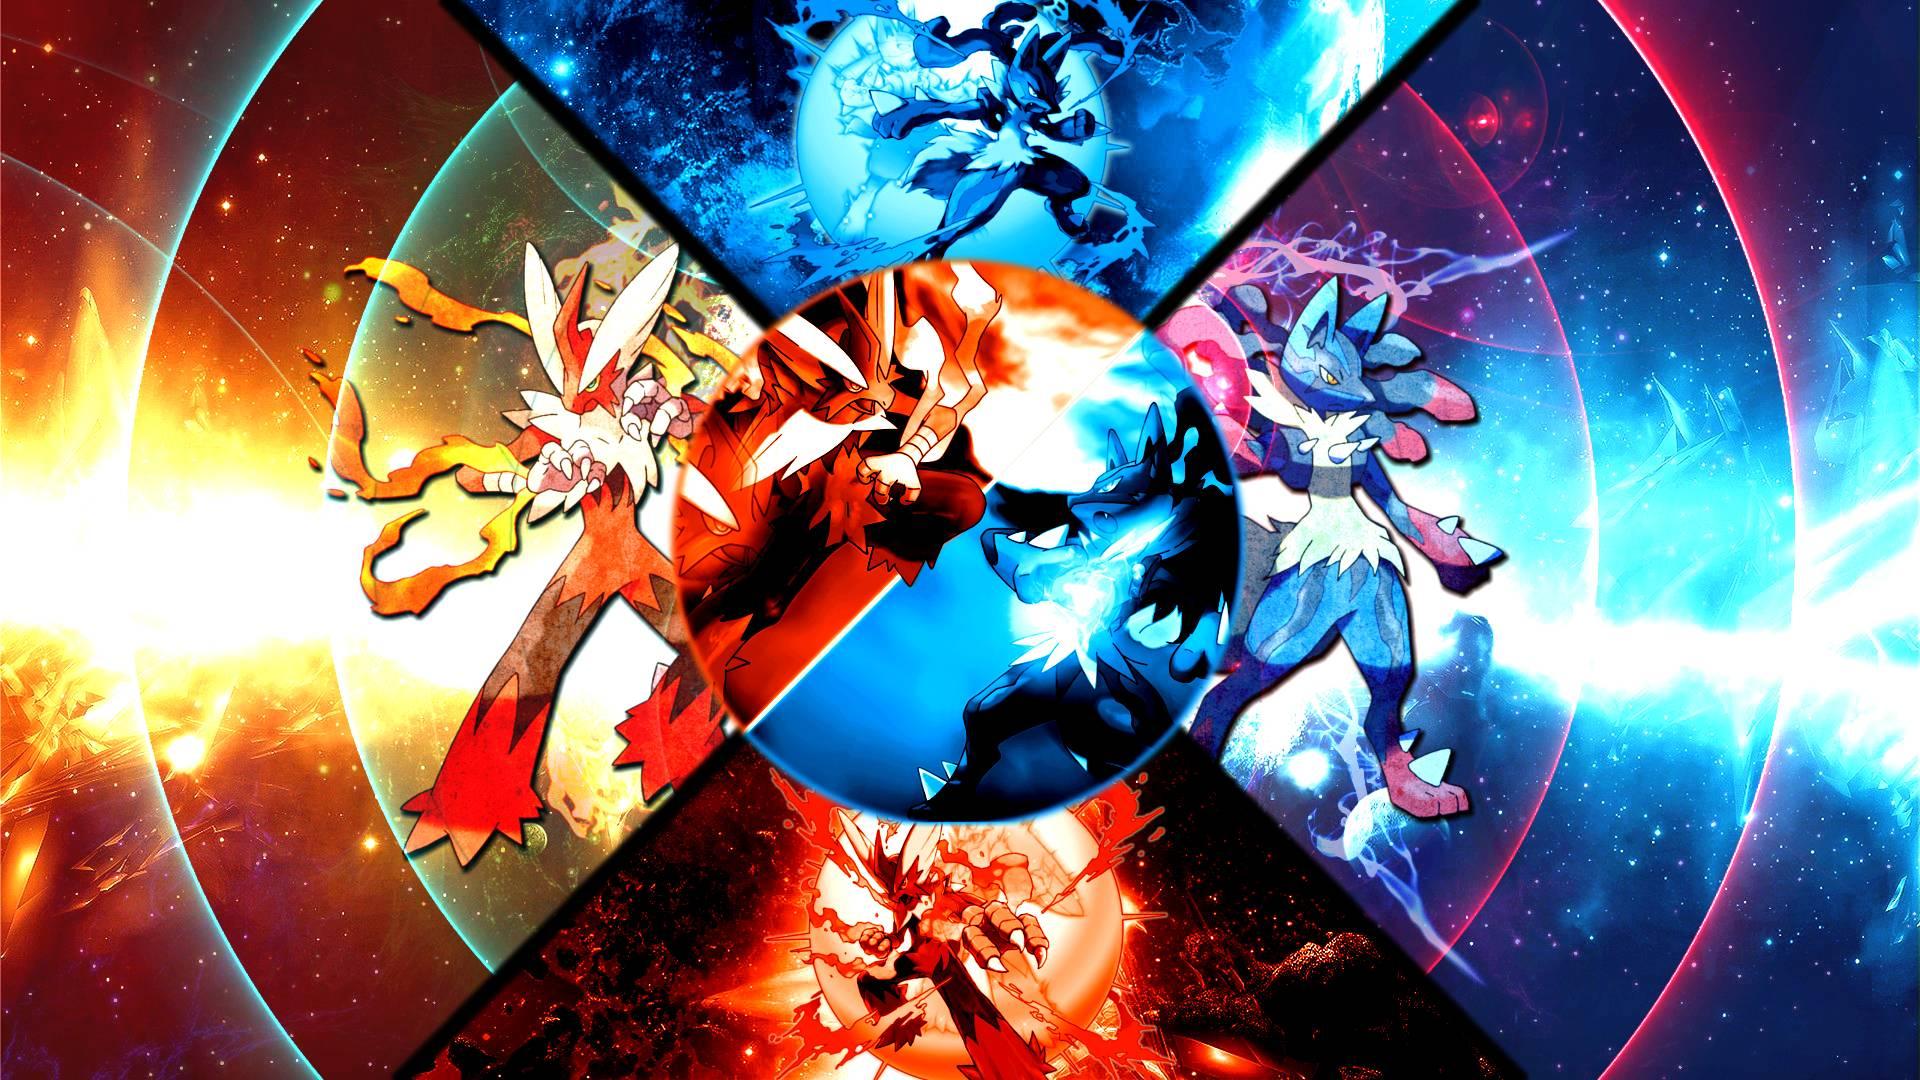 1920x1080 hd pokemon wallpapers lucario - photo #27